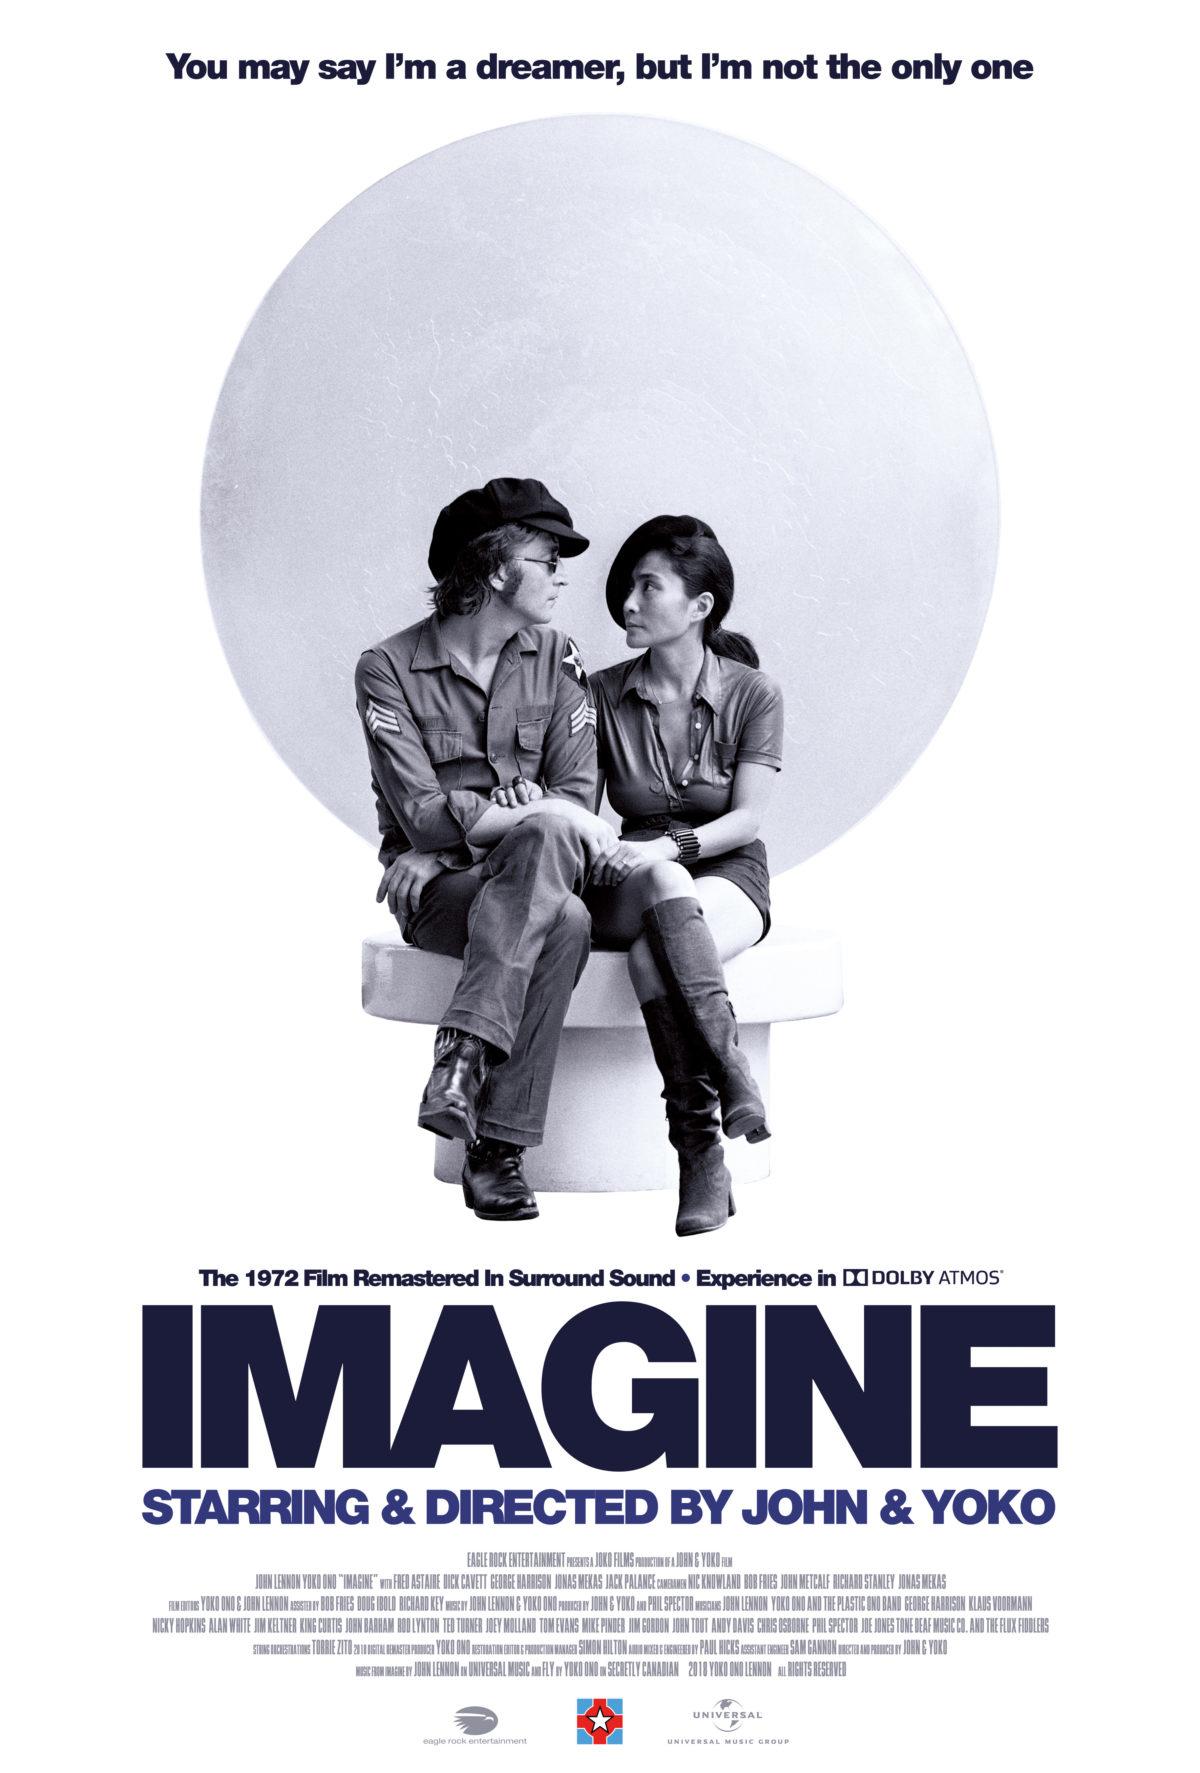 John Lennon Imagine Film Audio And Dvd Bluray On The Way Beatles Blog